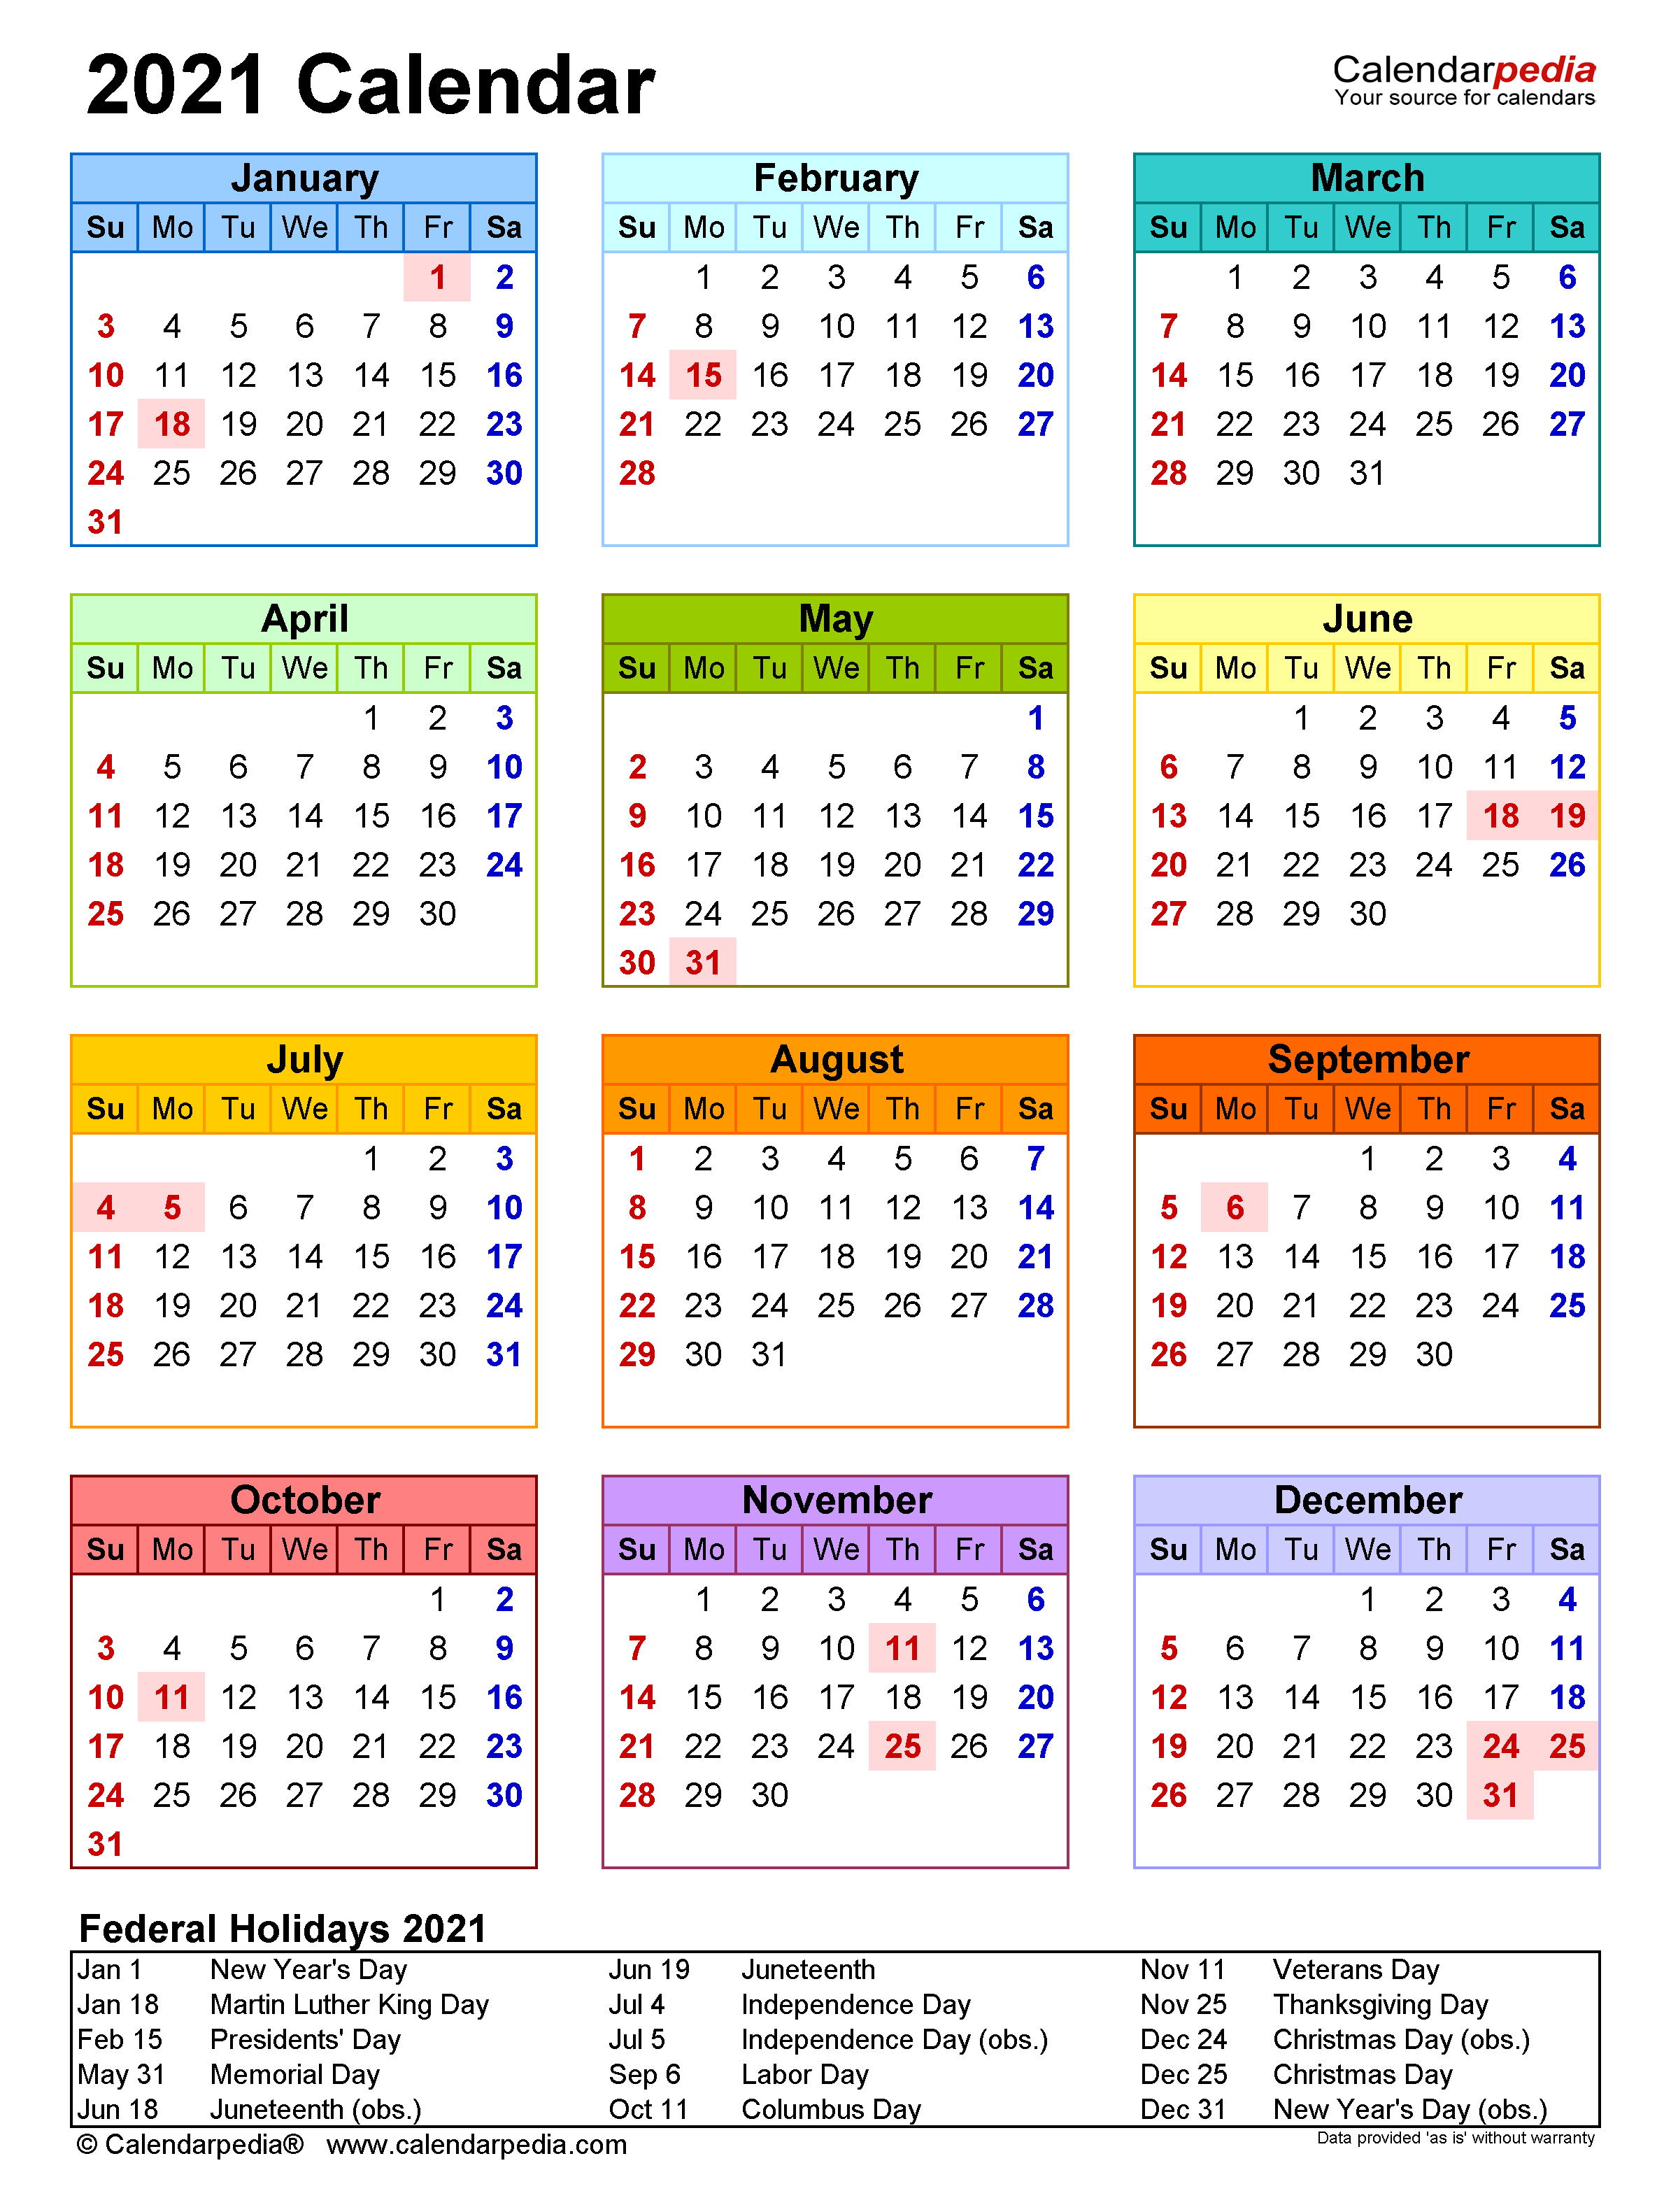 Calendar Printable Pdf Calendarpedia 2021 | Printable March